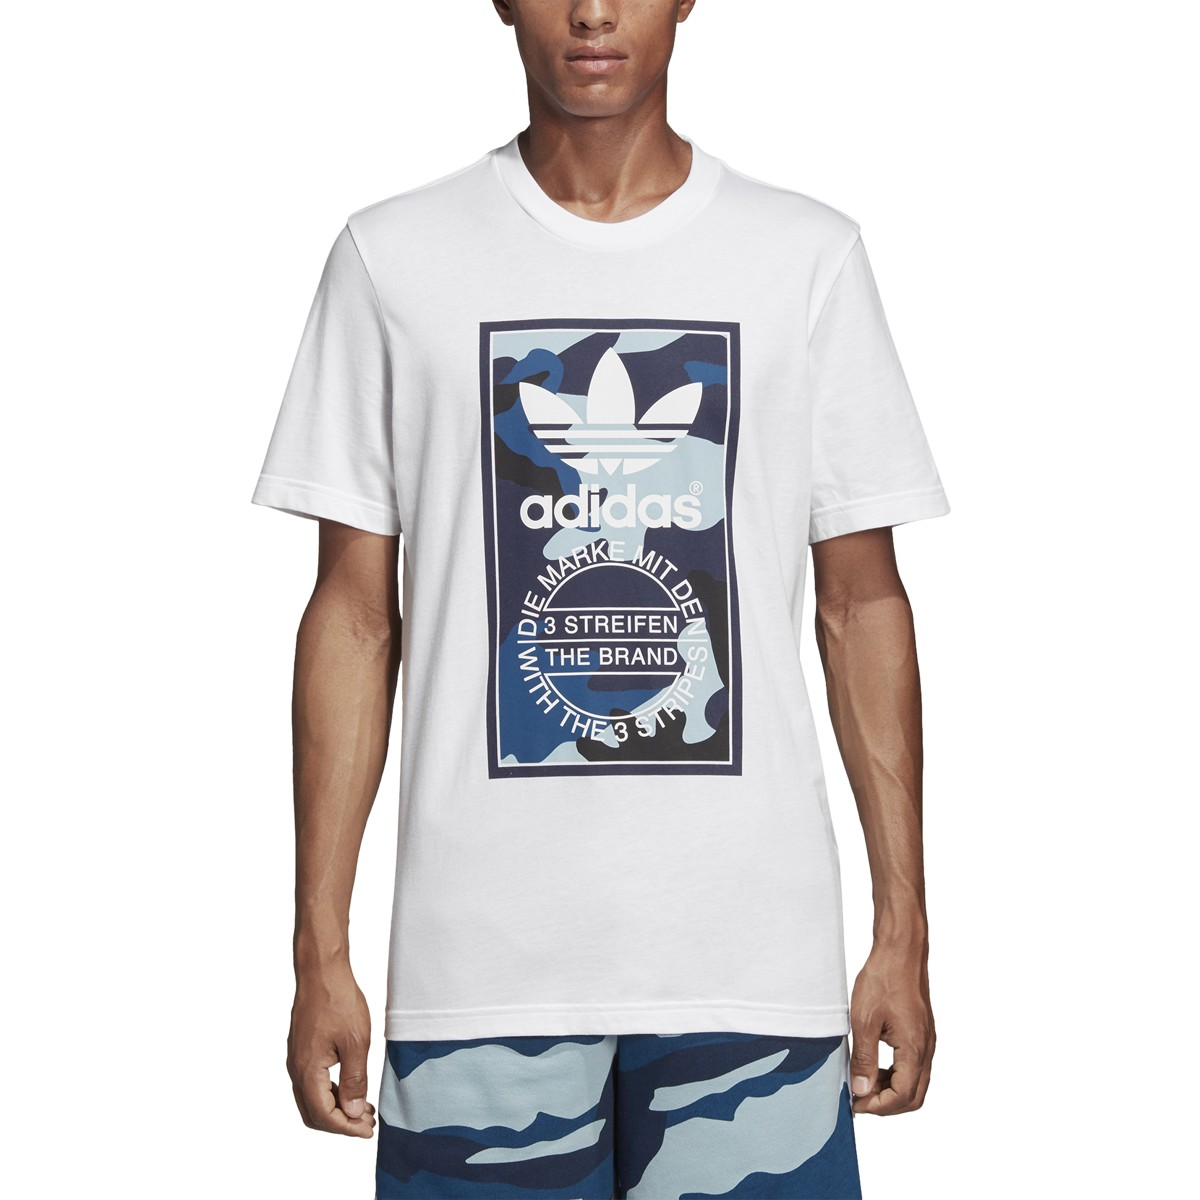 3b16f845b1e Details about Adidas Men s Originals Camouflage Tongue Label Tee White  DX3662